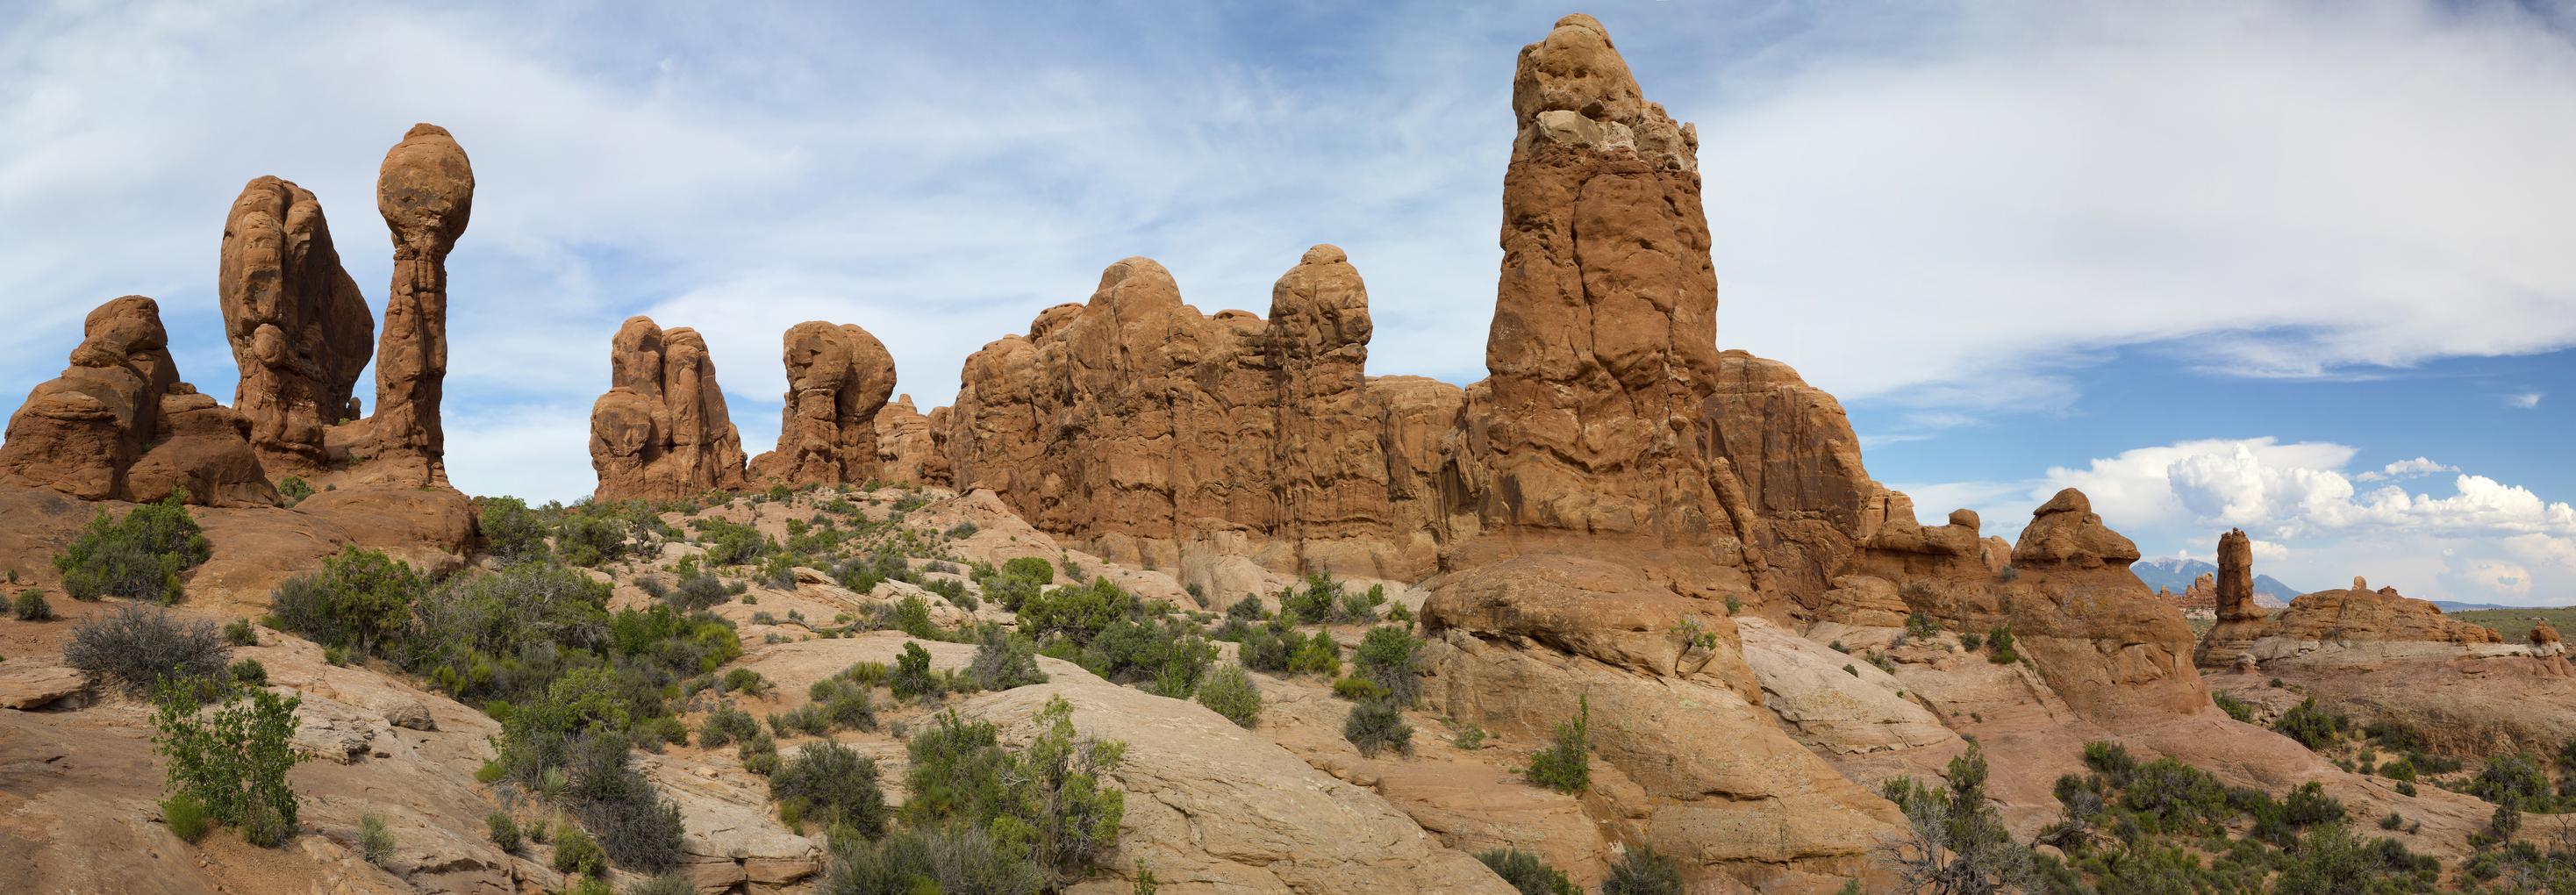 Pillars of rock in Arizona.